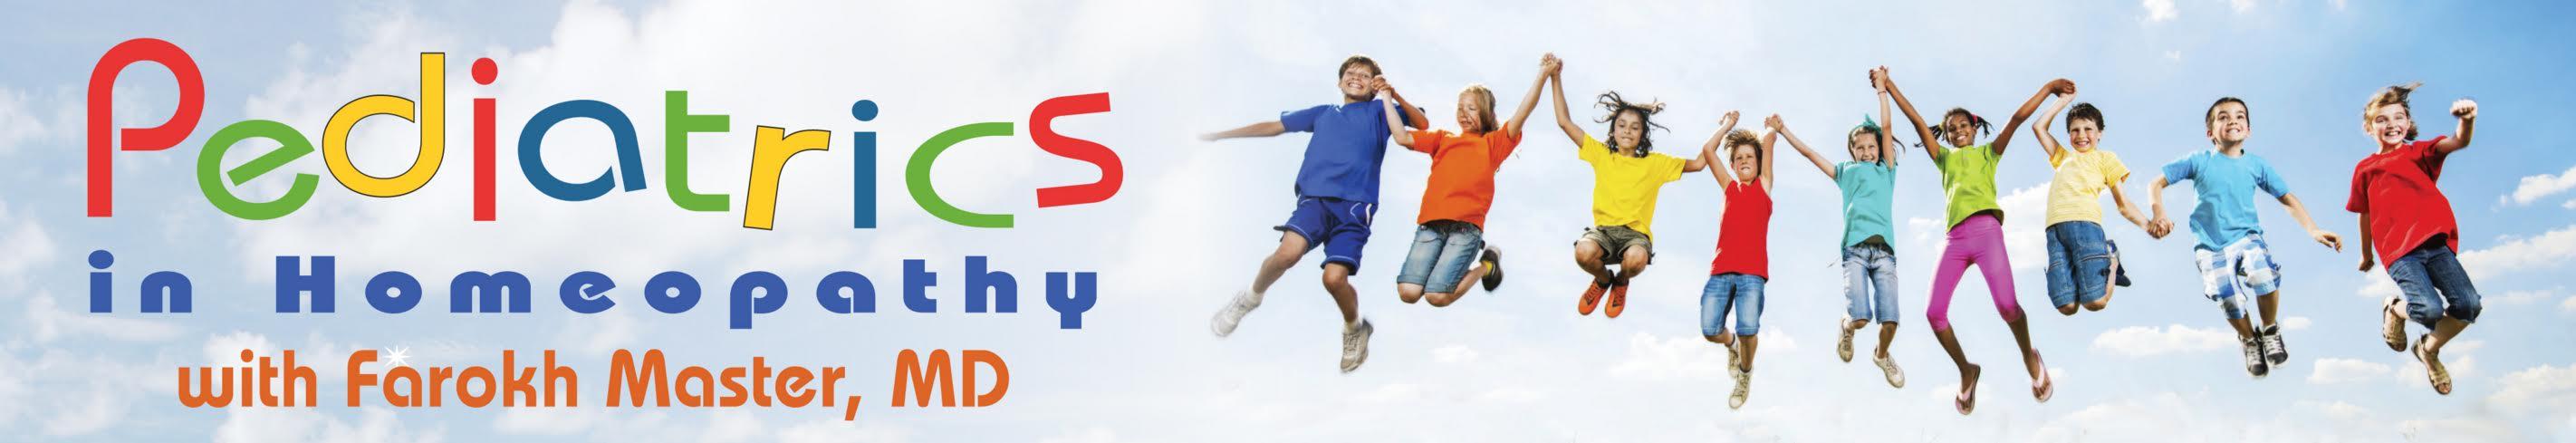 Pediatrics banner